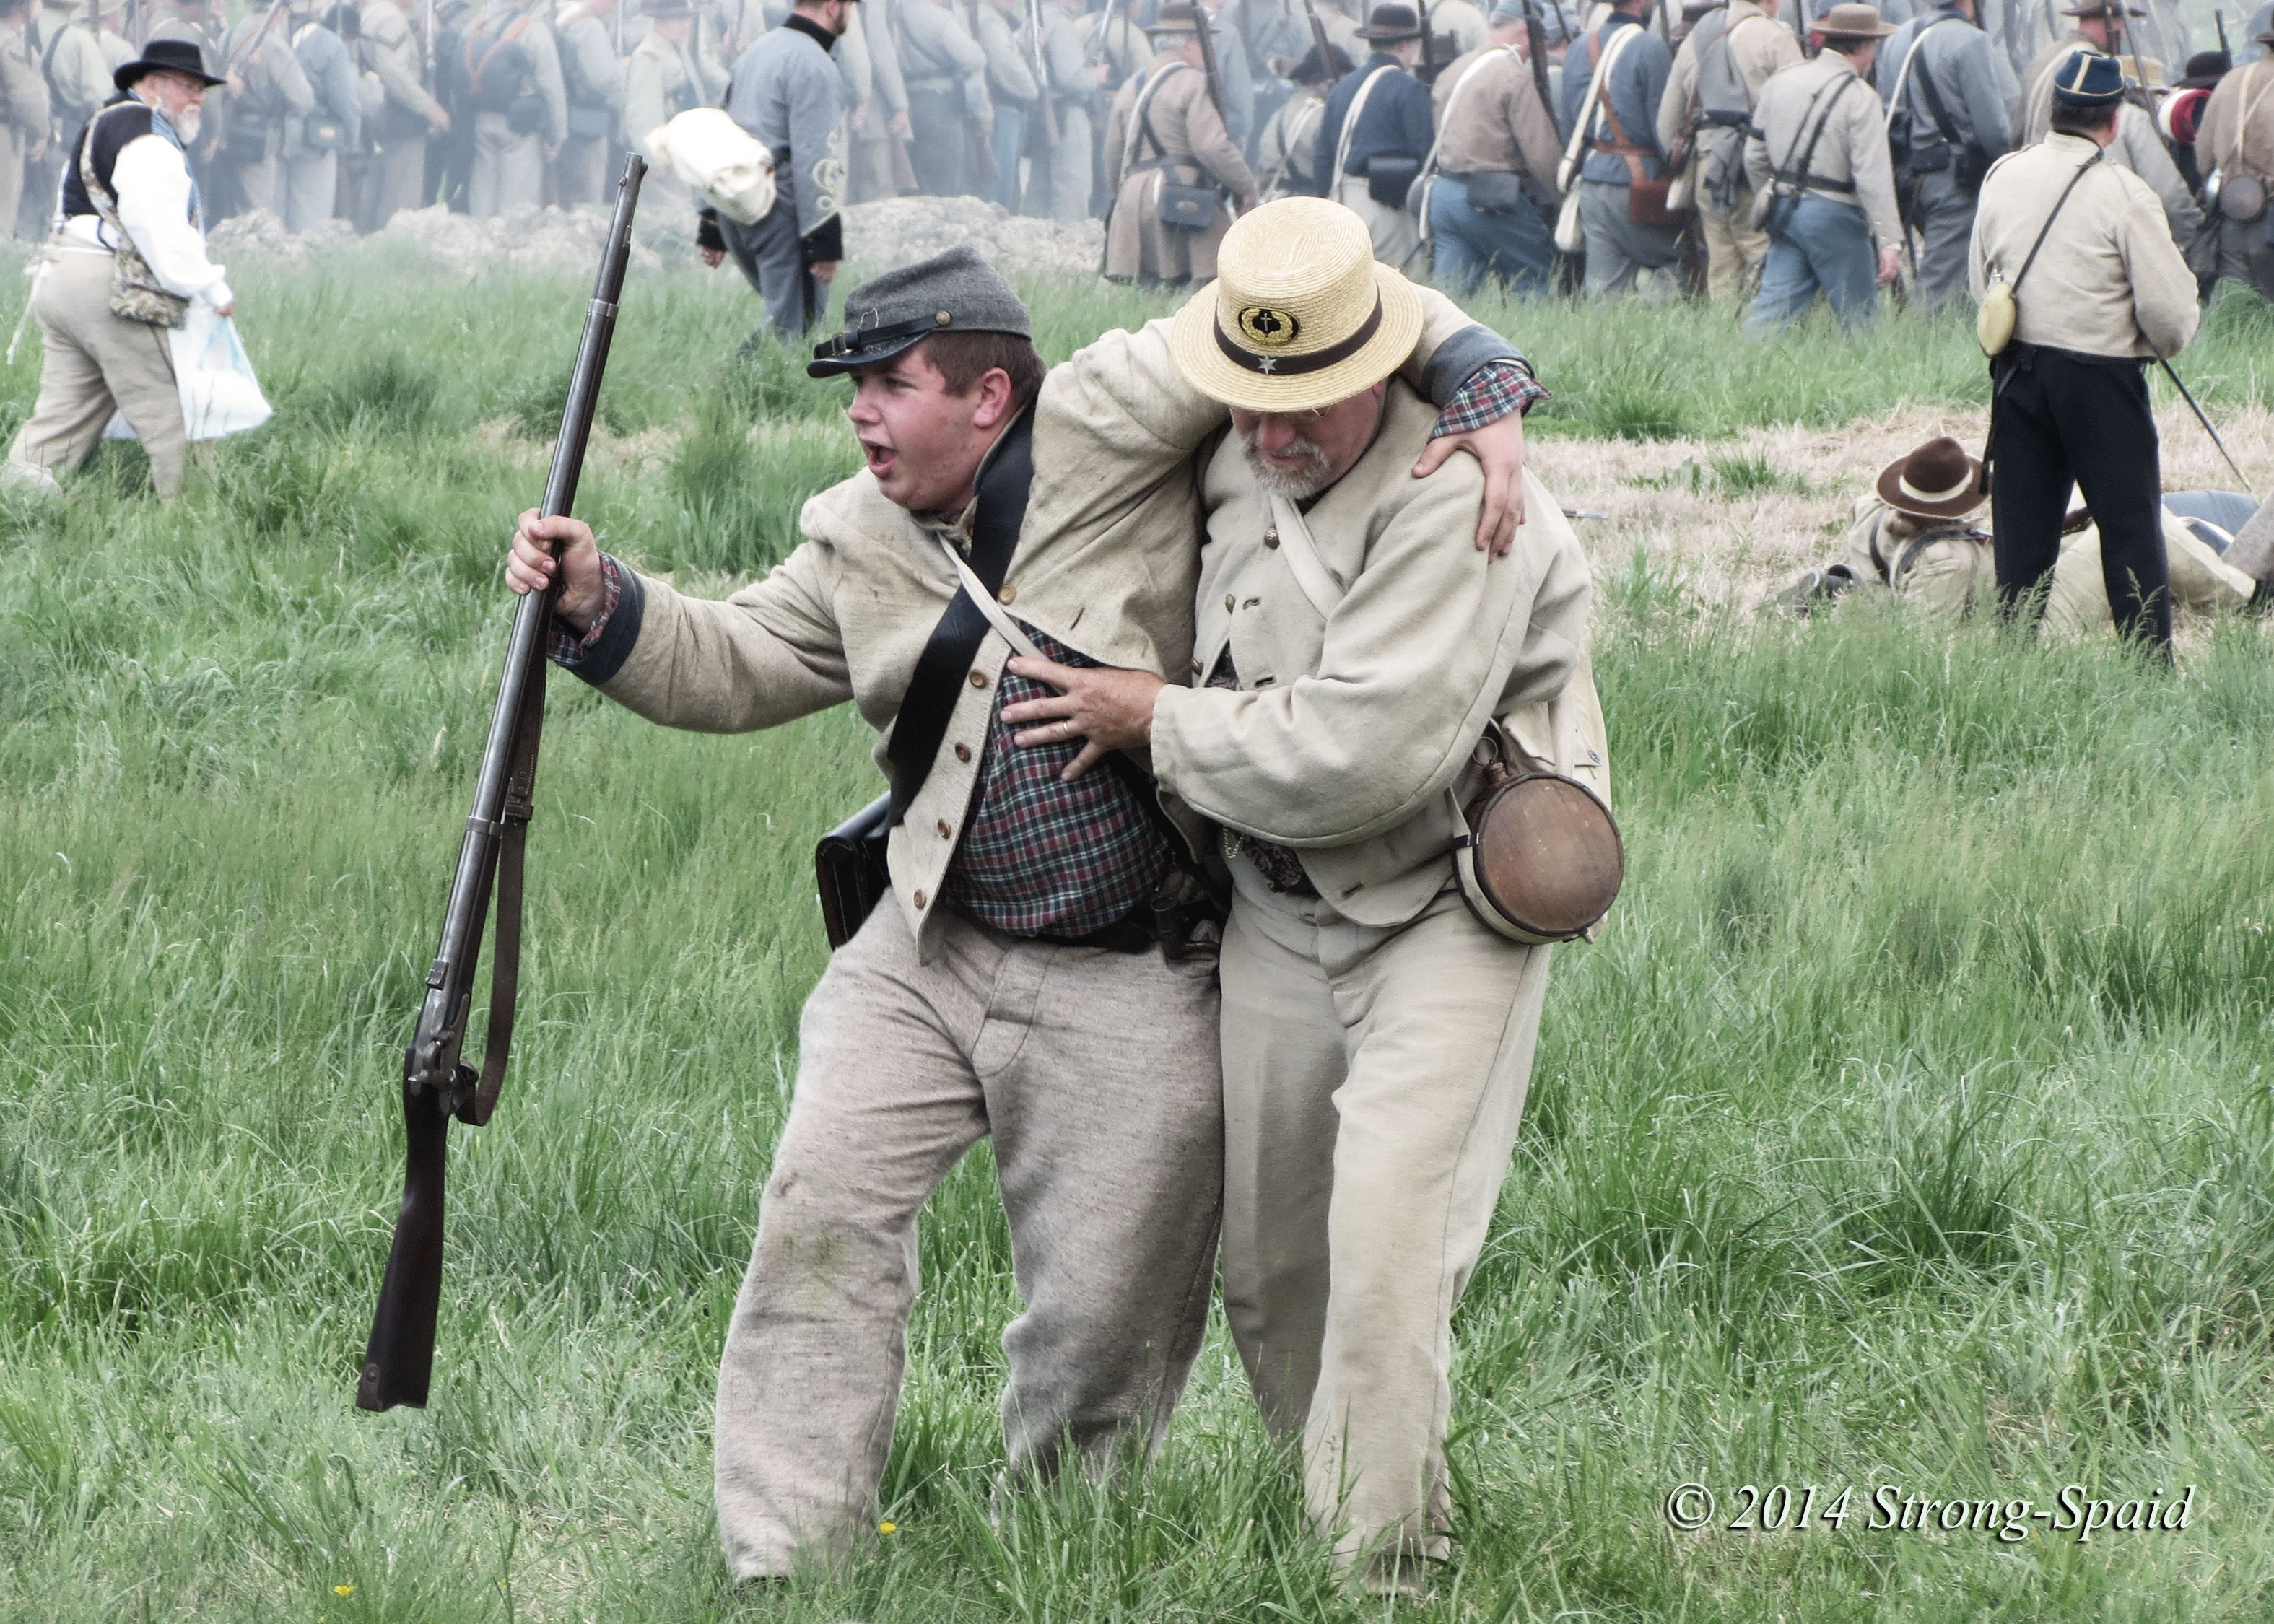 civil-war-reenactment_26.jpg (3150×2250)